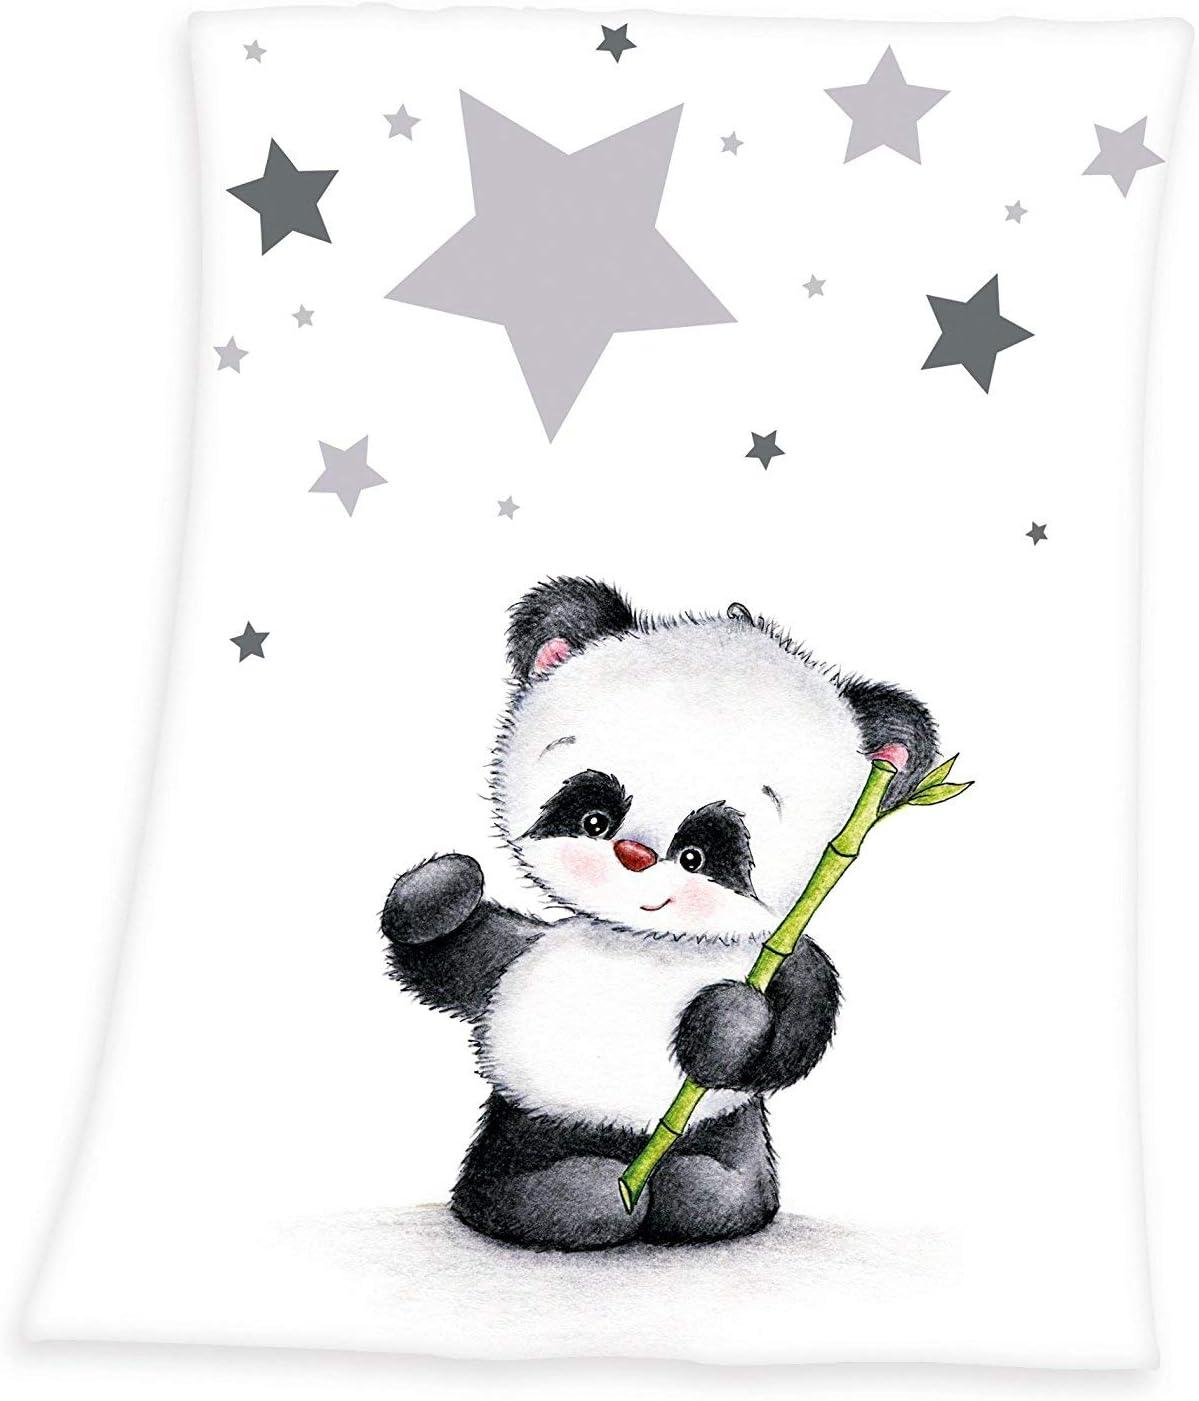 Winnie Puuh Flauschdecke Babydecke 75x100 weiß grau Winnie Pooh